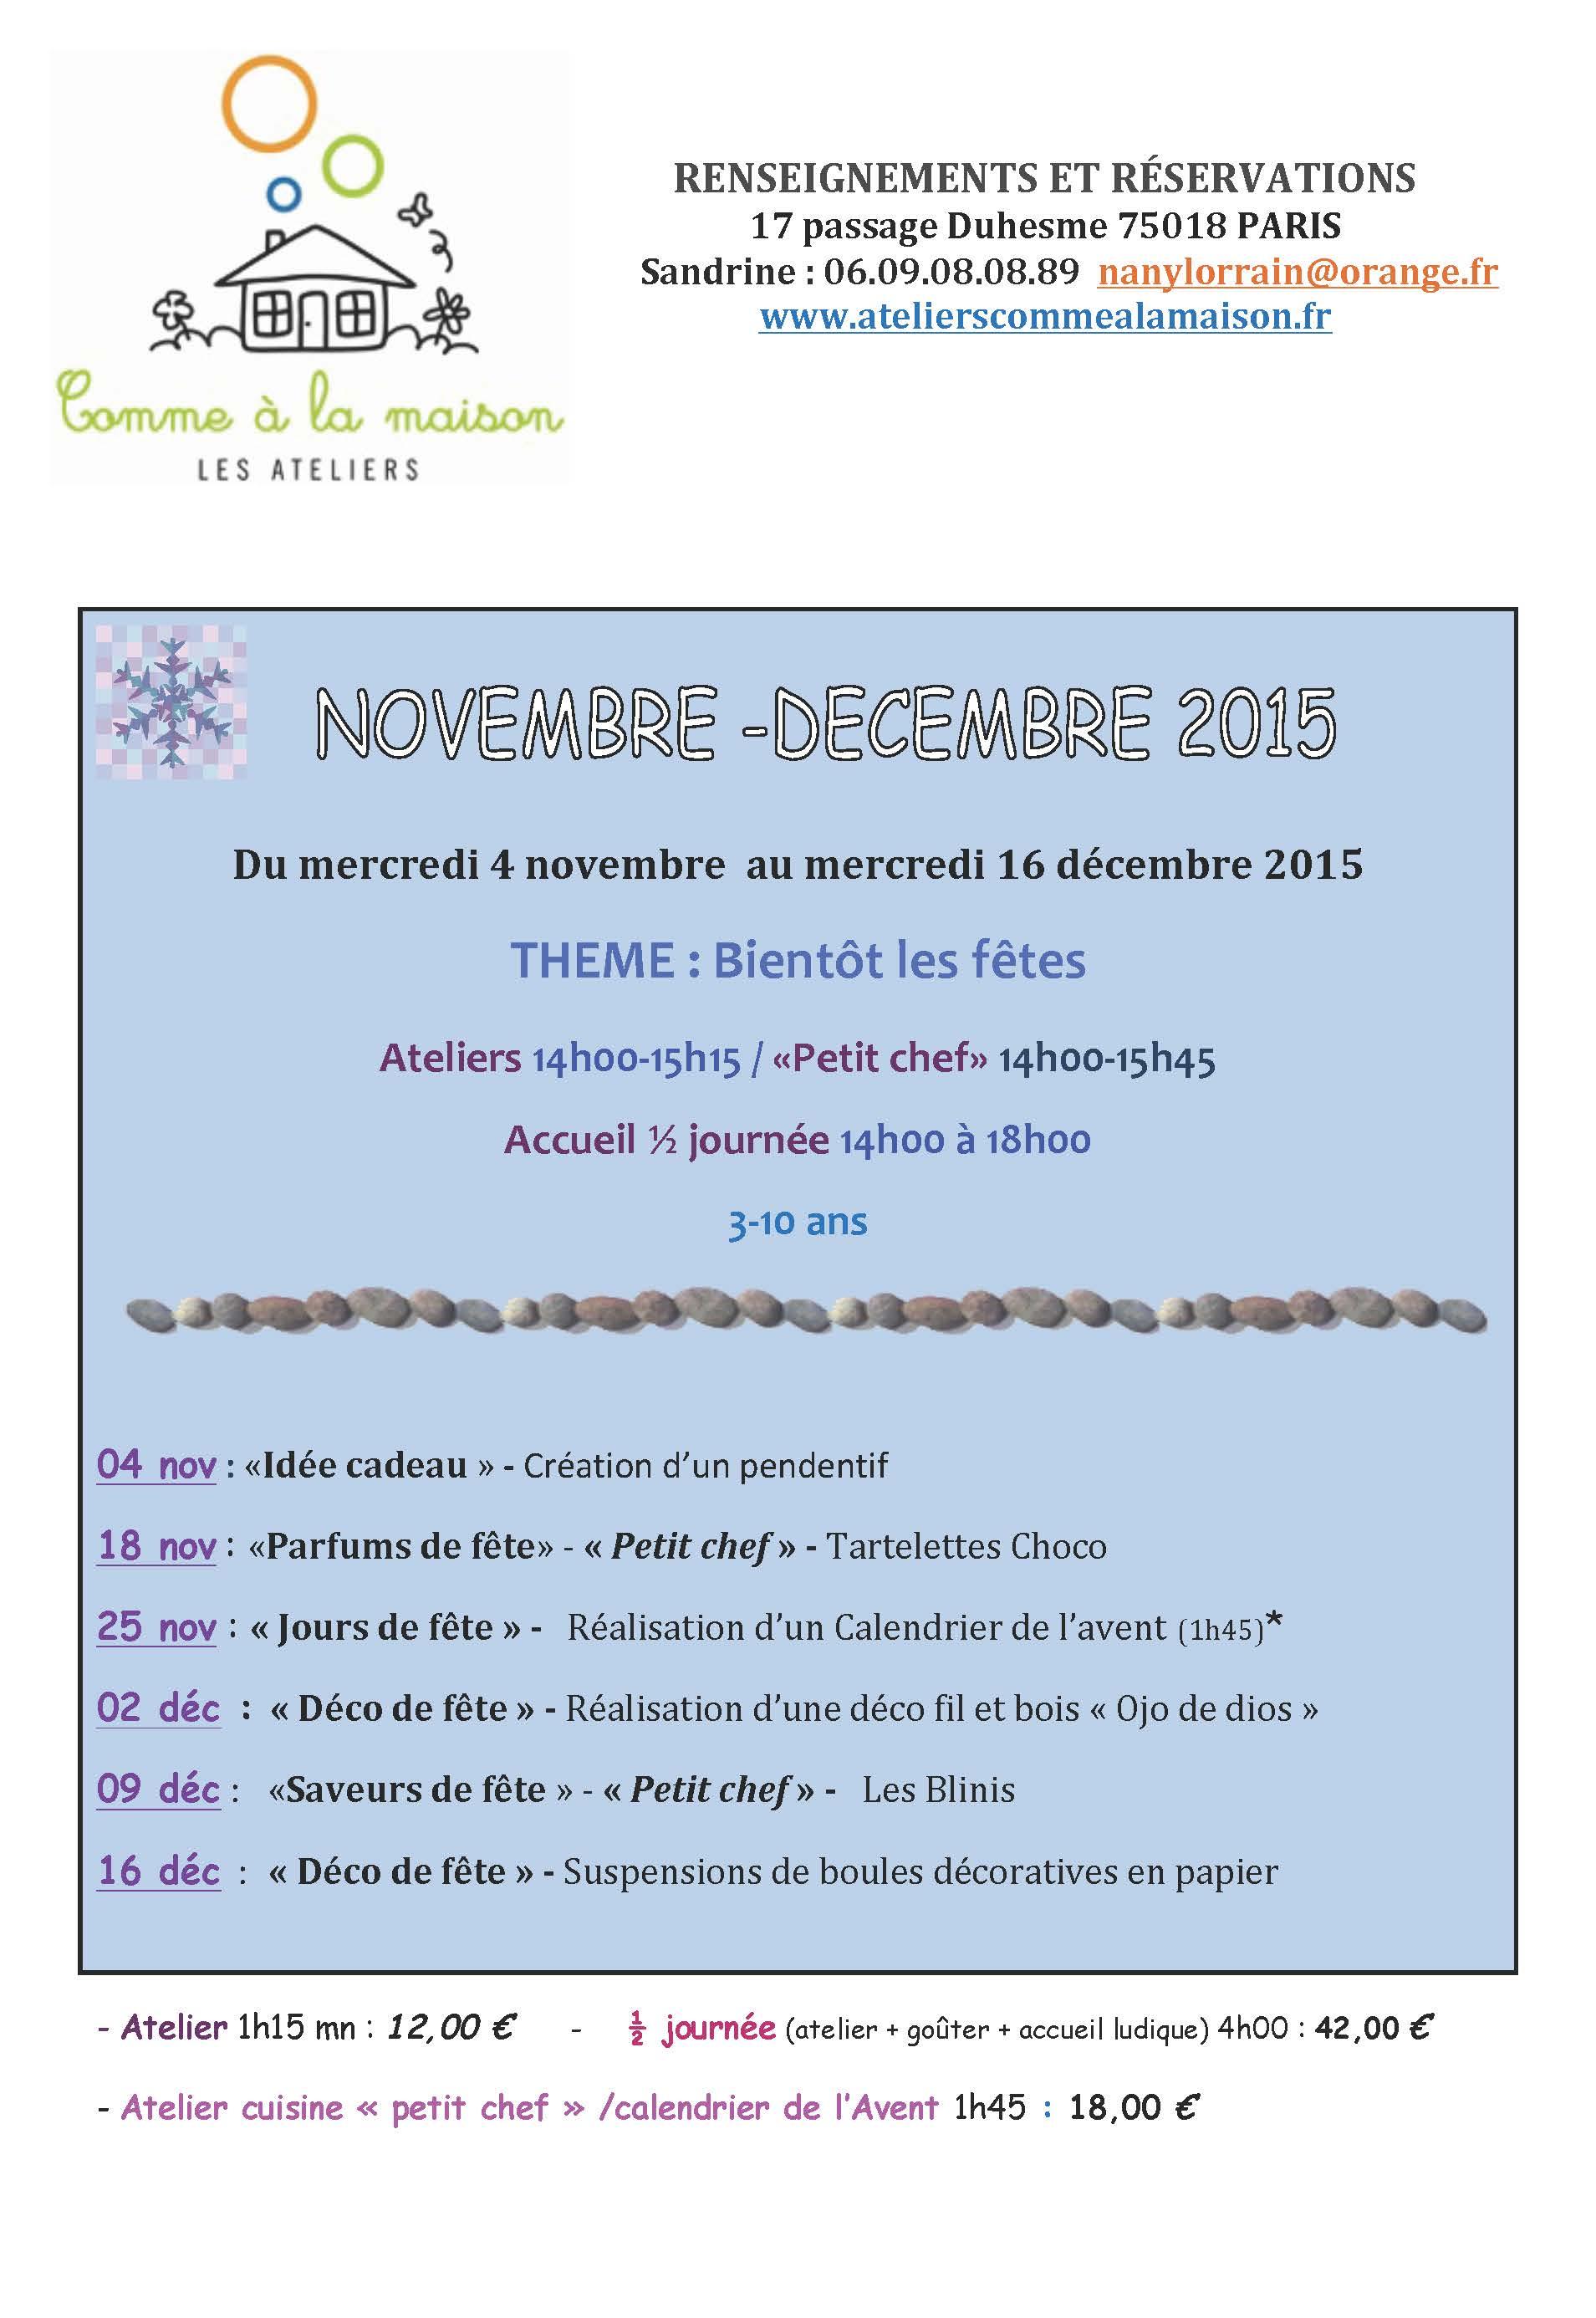 PROGRAMME NOVEMBRE-DECEMBRE  2015